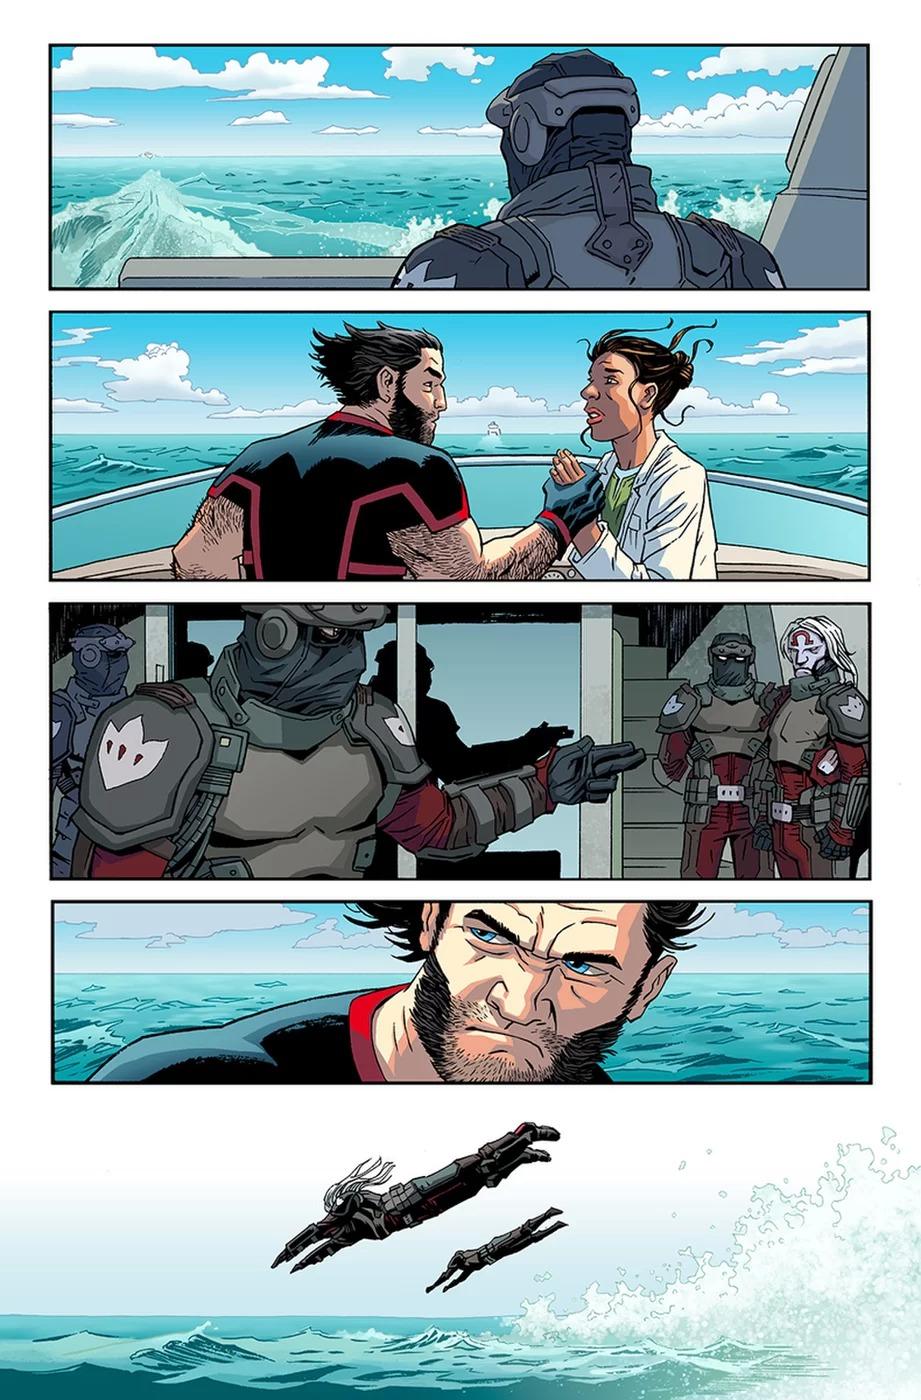 Return of Wolverine #2, anteprima 02